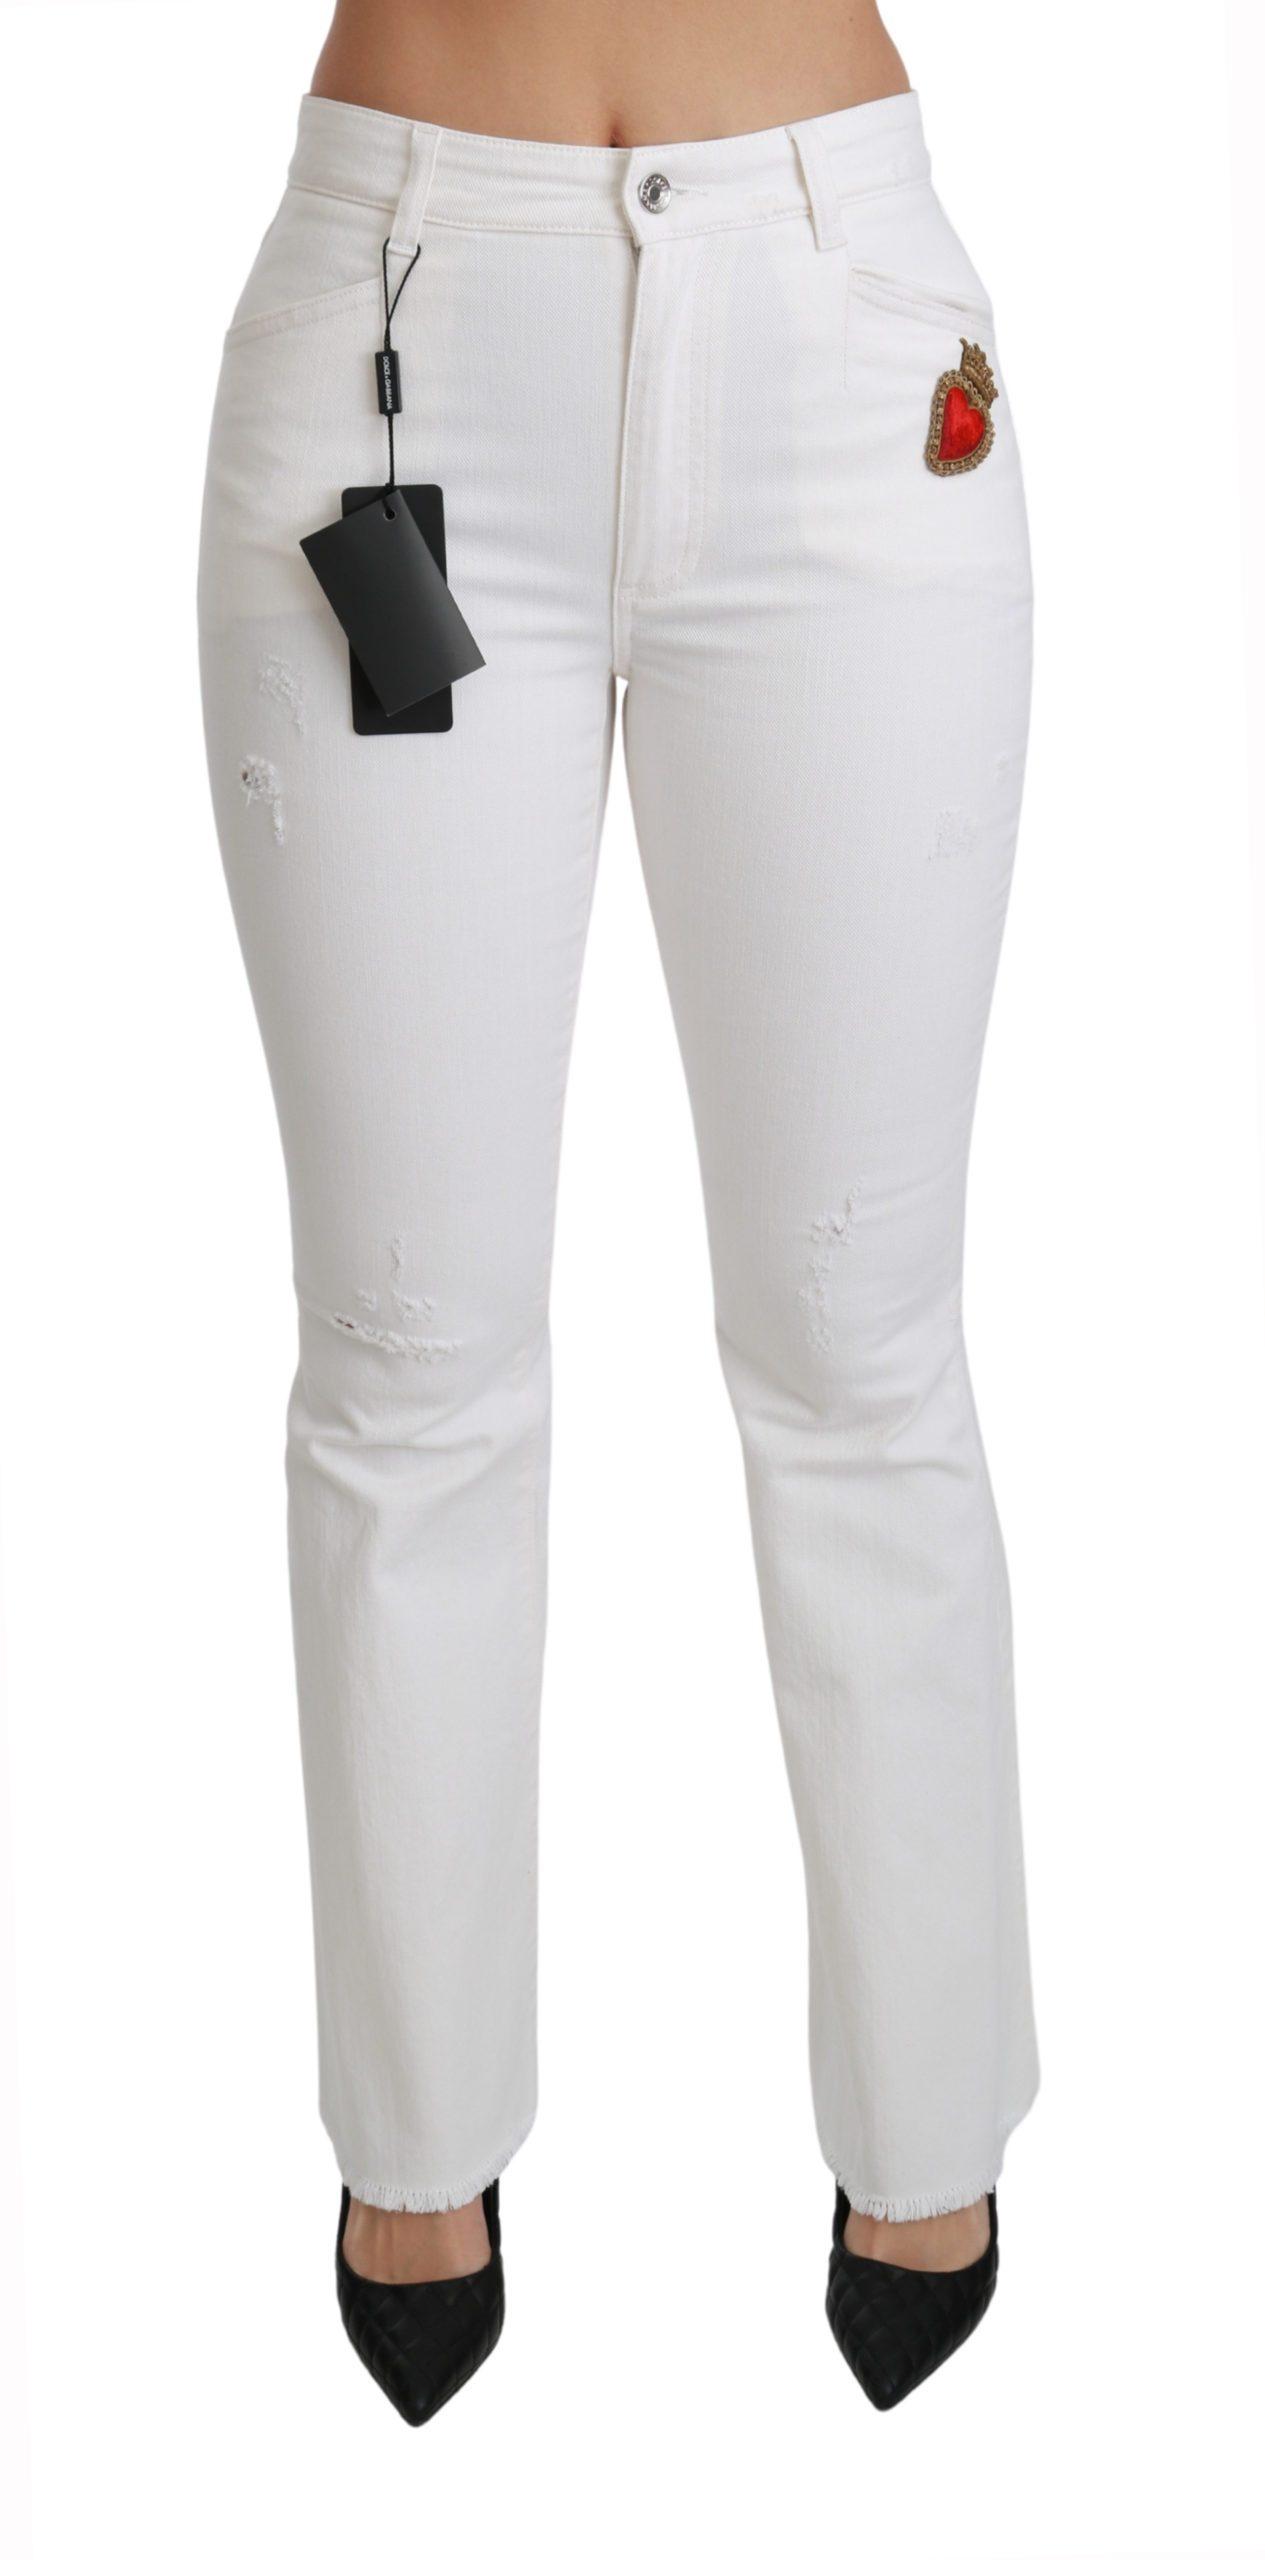 Dolce & Gabbana Women's Heart Flared Stretch Cotton Trouser White PAN70897 - IT36 | XS